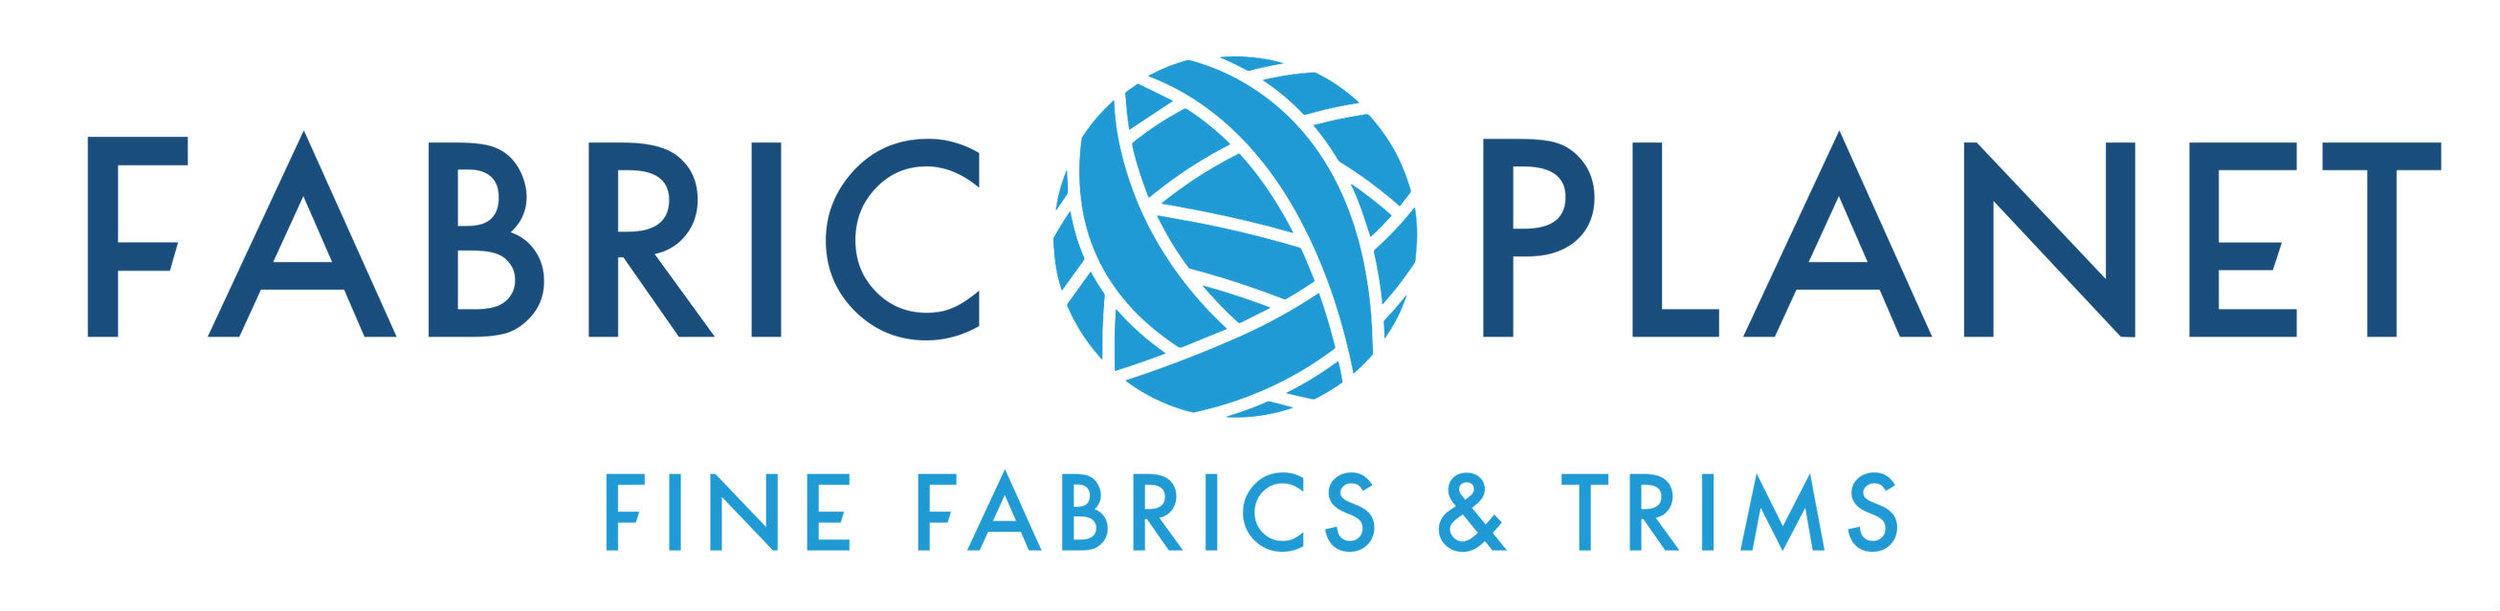 fabric planet logo full color.jpg